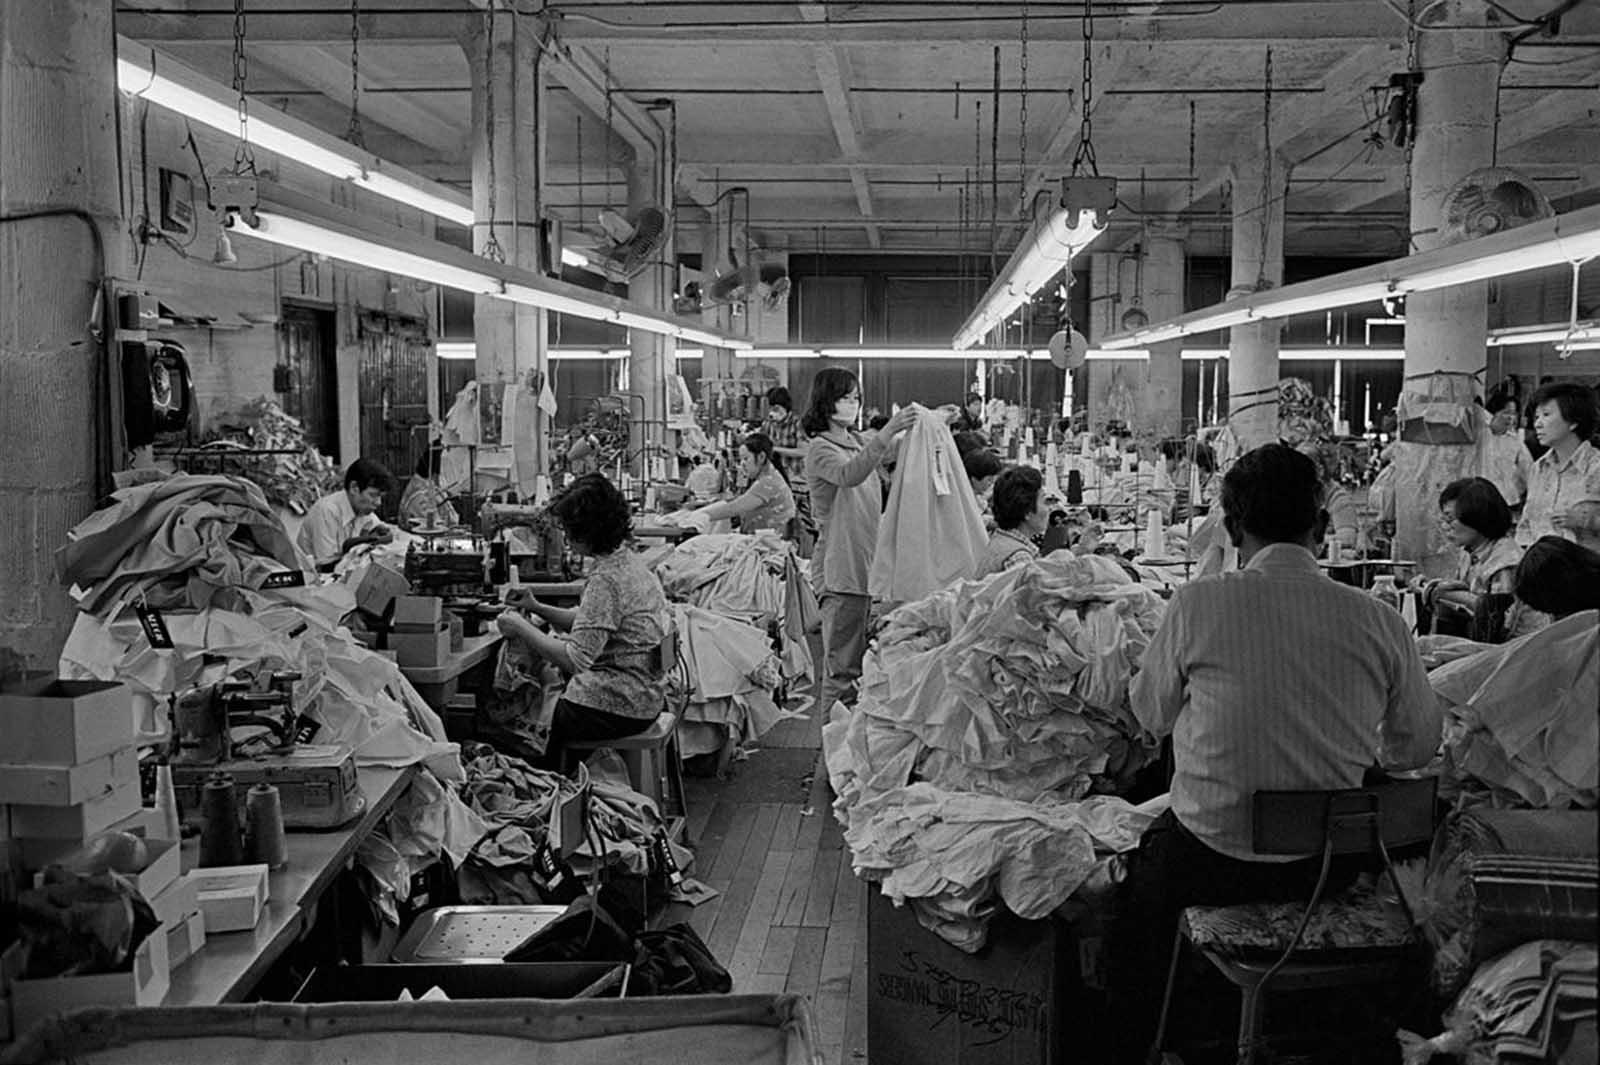 Fábrica de ropa, 1983.